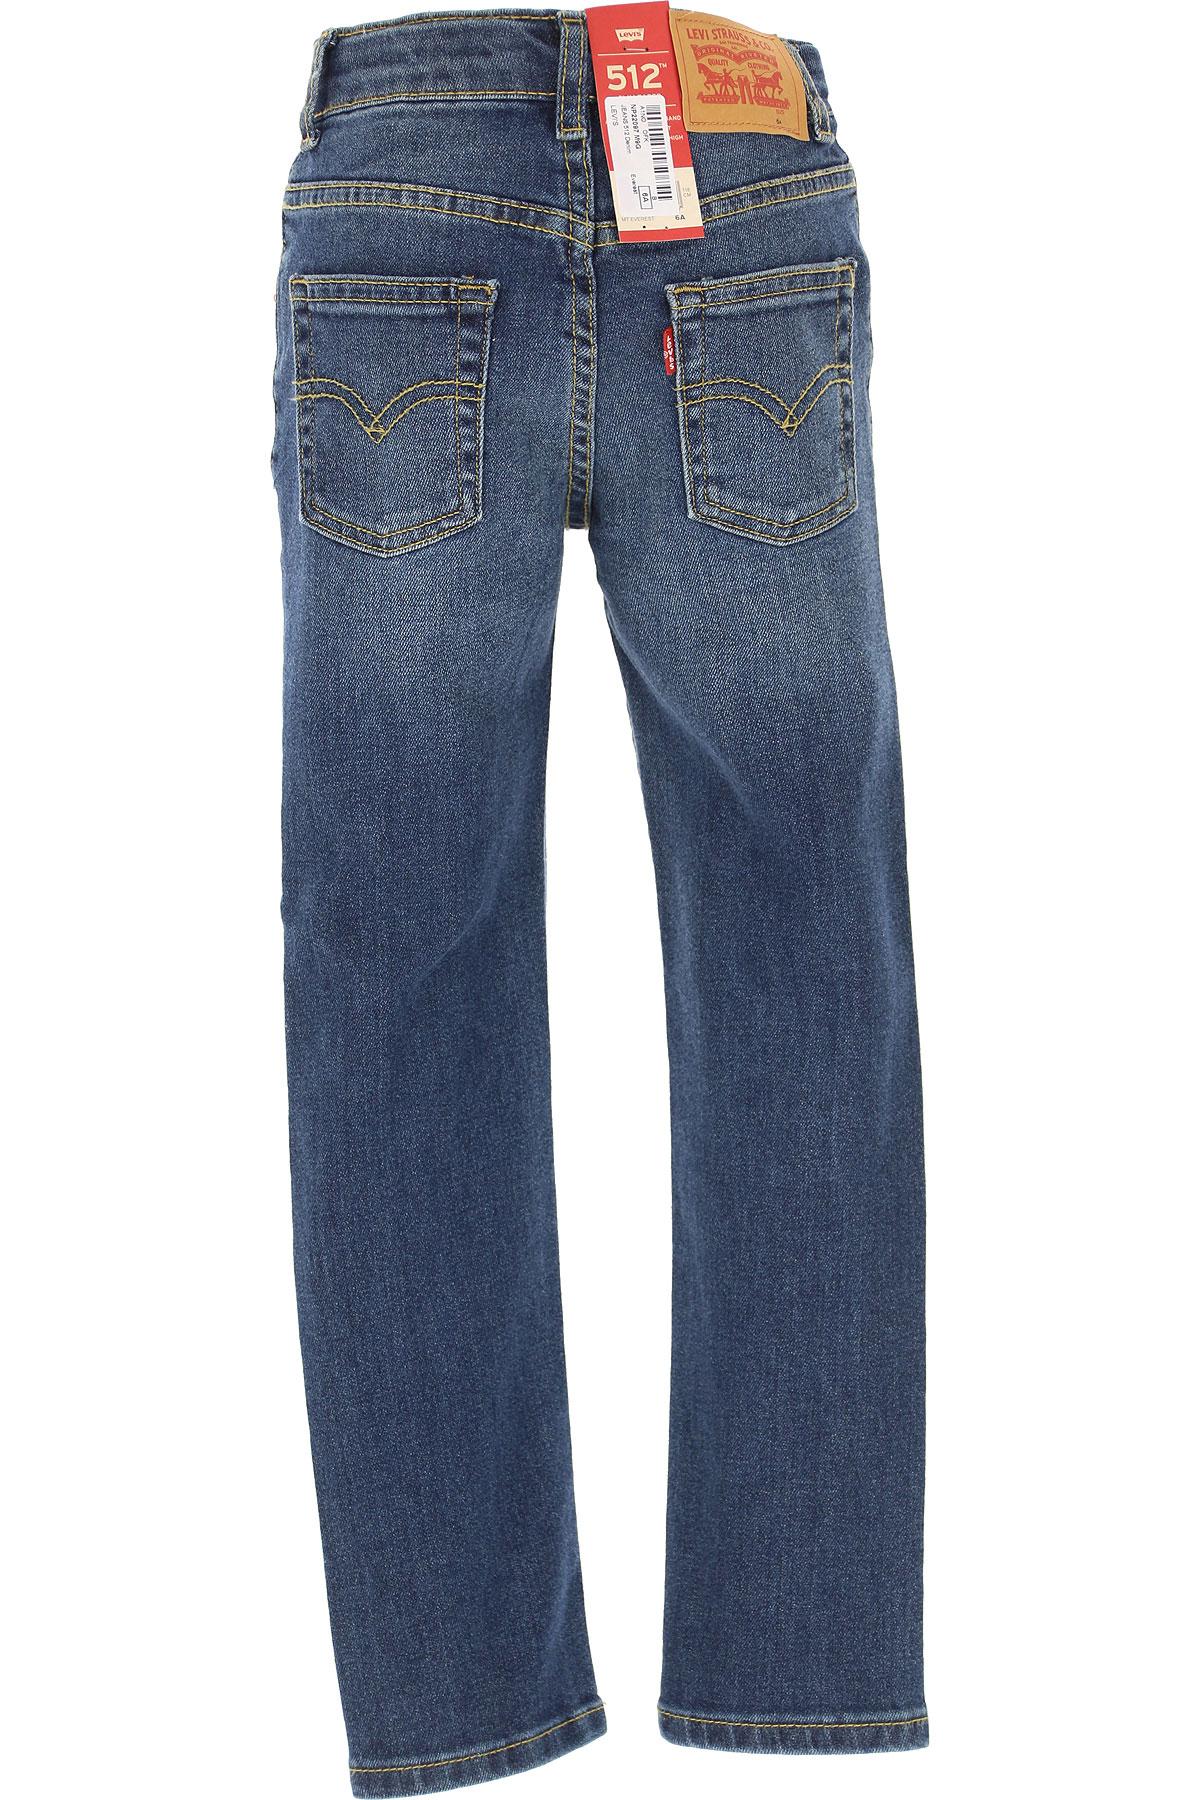 Levis Kids Jeans for Boys On Sale, Blue Denim, Cotto, 2019, 10Y 4Y